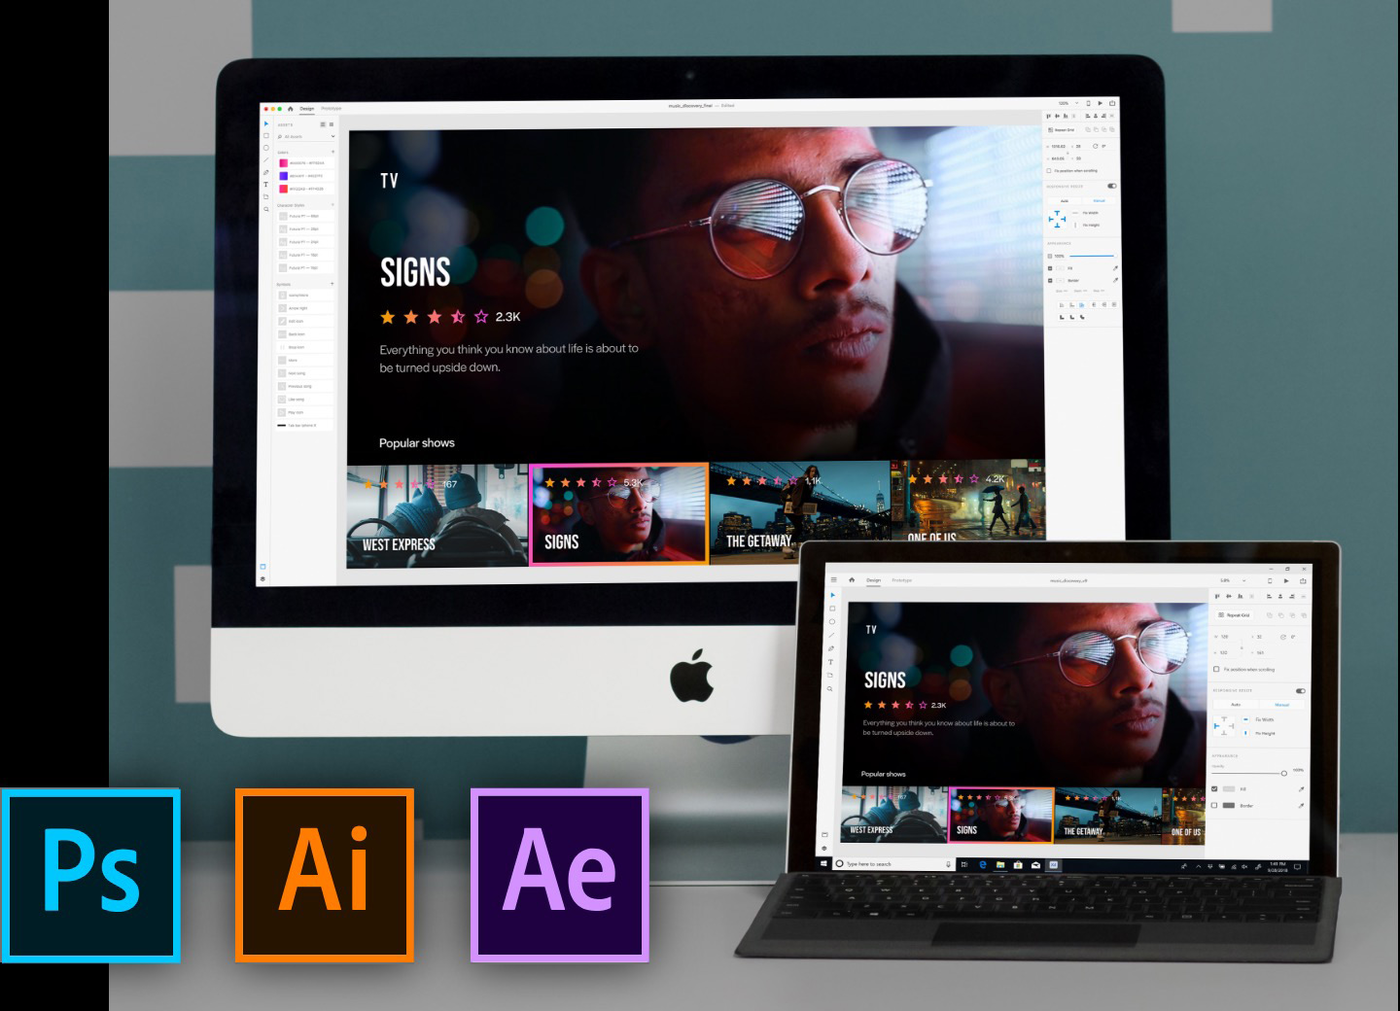 Adobe Xd Assets And Apps On Any Platform Web Design Tools Web Design Tool Design